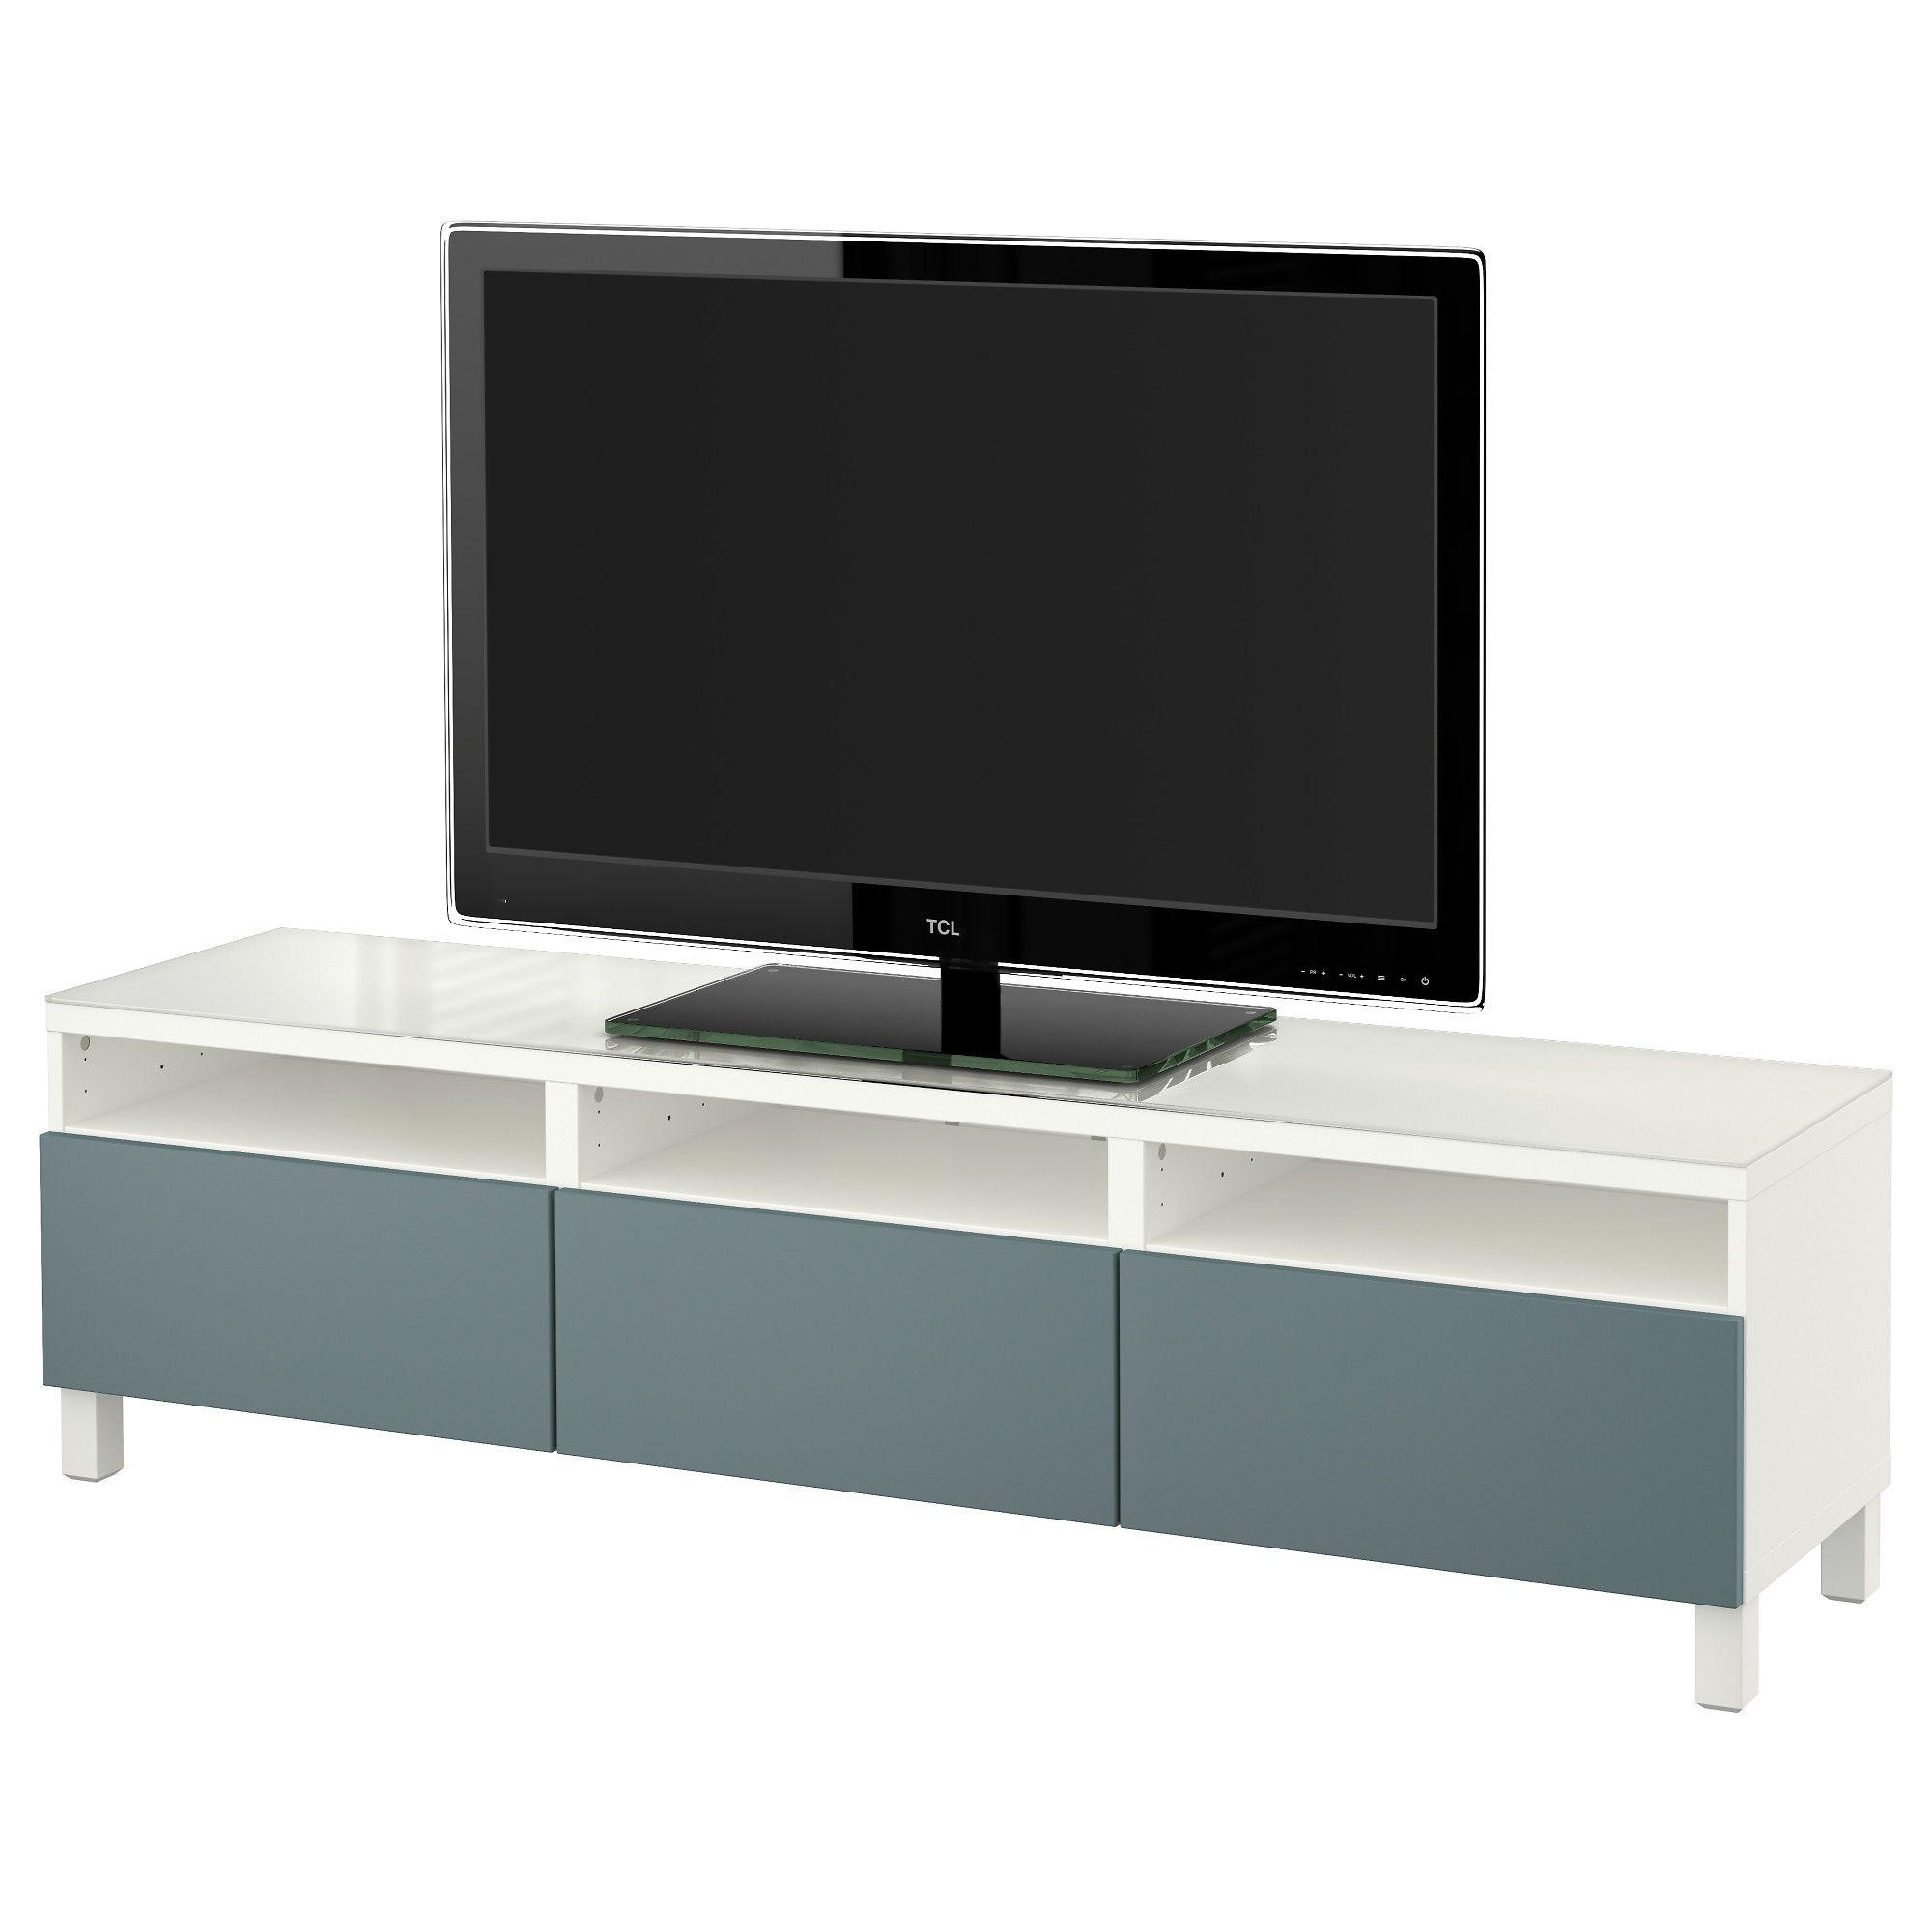 BESTÅ, TV-Bank mit Schubladen, weiß Jetzt bestellen unter: https://moebel.ladendirekt.de/wohnzimmer/tv-hifi-moebel/tv-lowboards/?uid=37f2c082-5dbc-5771-b737-be5f45cb0ca4&utm_source=pinterest&utm_medium=pin&utm_campaign=boards #tvlowboards #wohnzimmer #tvhifimoebel